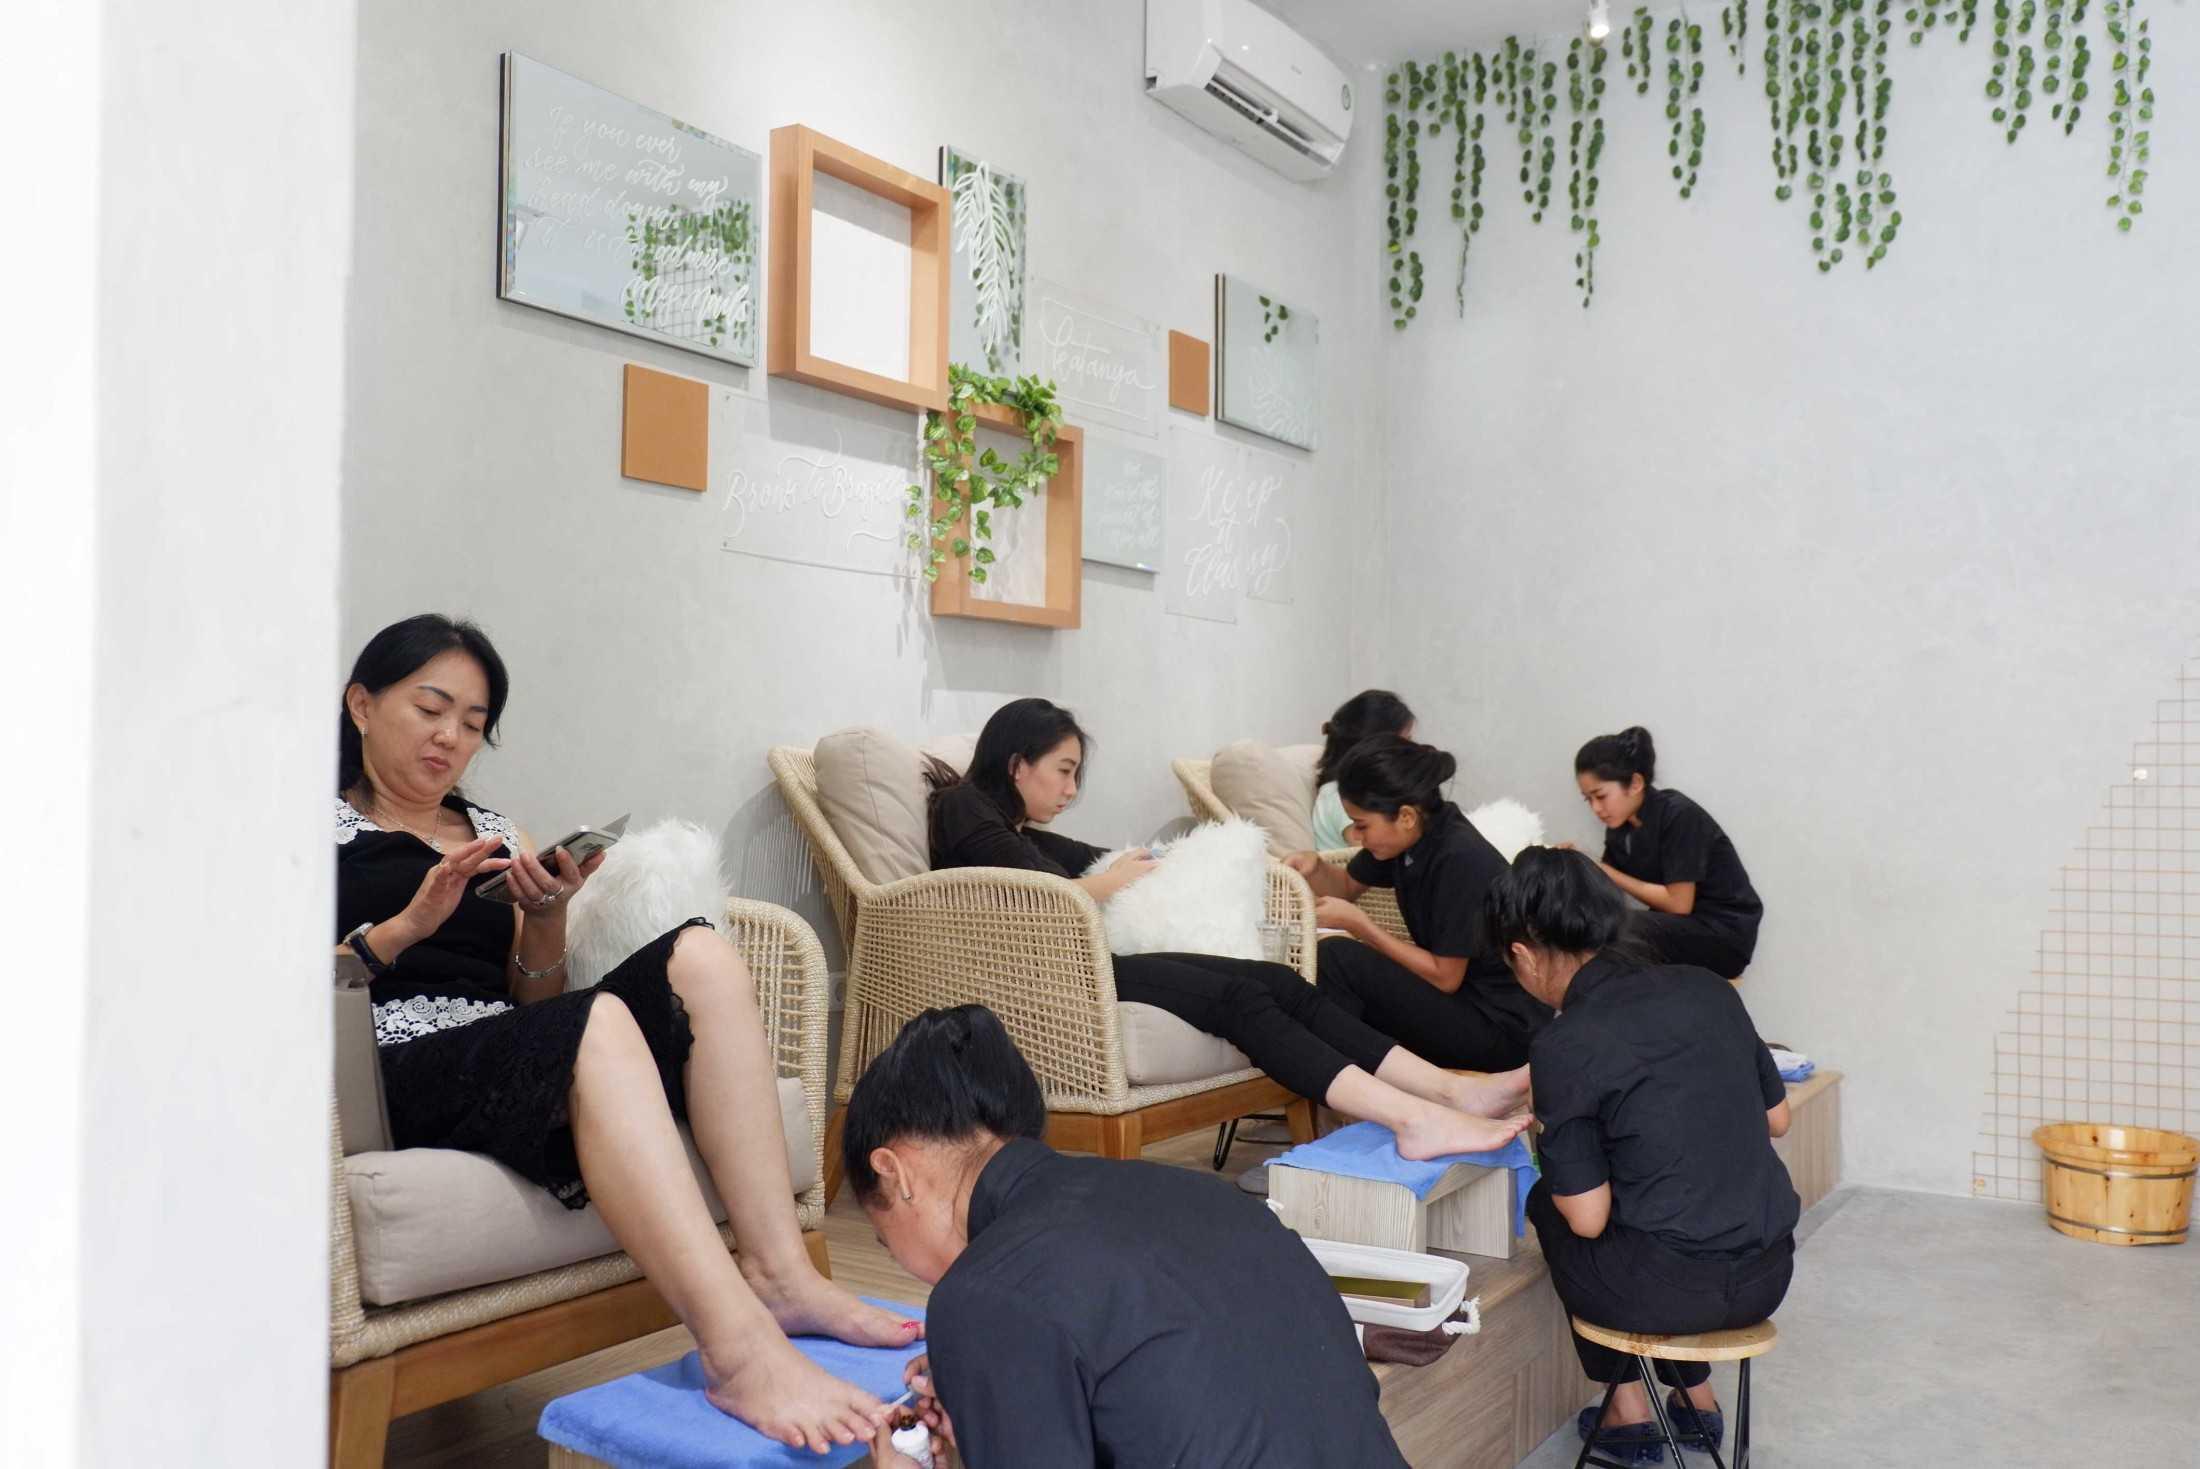 Studio Kuskus Katanya Beauty Studio Citra 6 Ruko Citra Garden 6 J5B No. 7, Tegal Alur, Kalideres, Rt.2/rw.5, Tegal Alur, Kalideres, West Jakarta City, Jakarta 11820, Indonesia Ruko Citra Garden 6 J5B No. 7, Tegal Alur, Kalideres, Rt.2/rw.5, Tegal Alur, Kalideres, West Jakarta City, Jakarta 11820, Indonesia Studio-Kuskus-Katanya-Beauty-Studio-Citra-6  70462